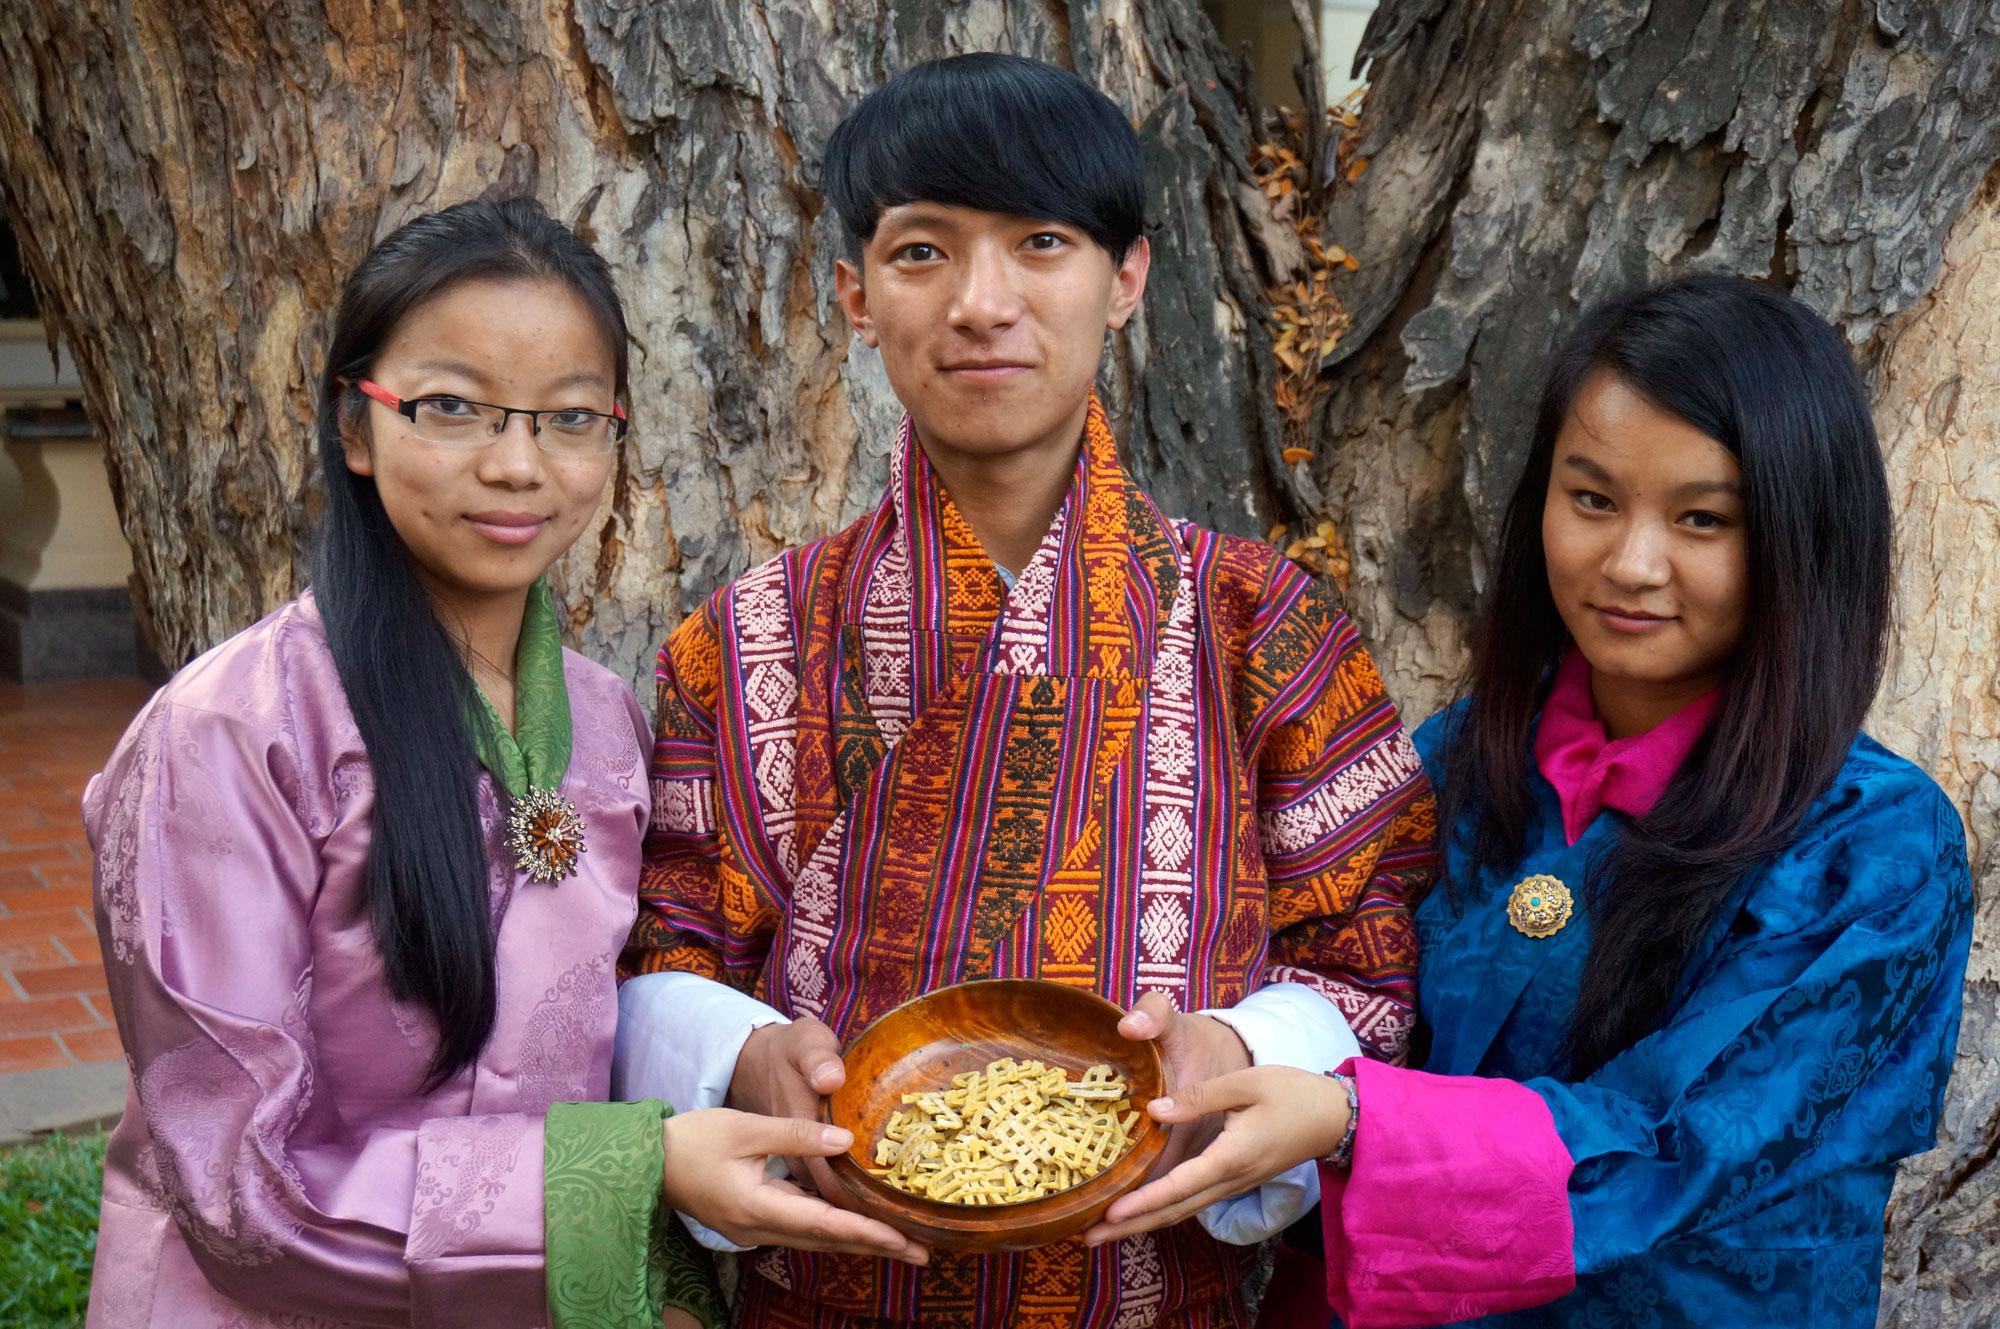 Bhutan pussy